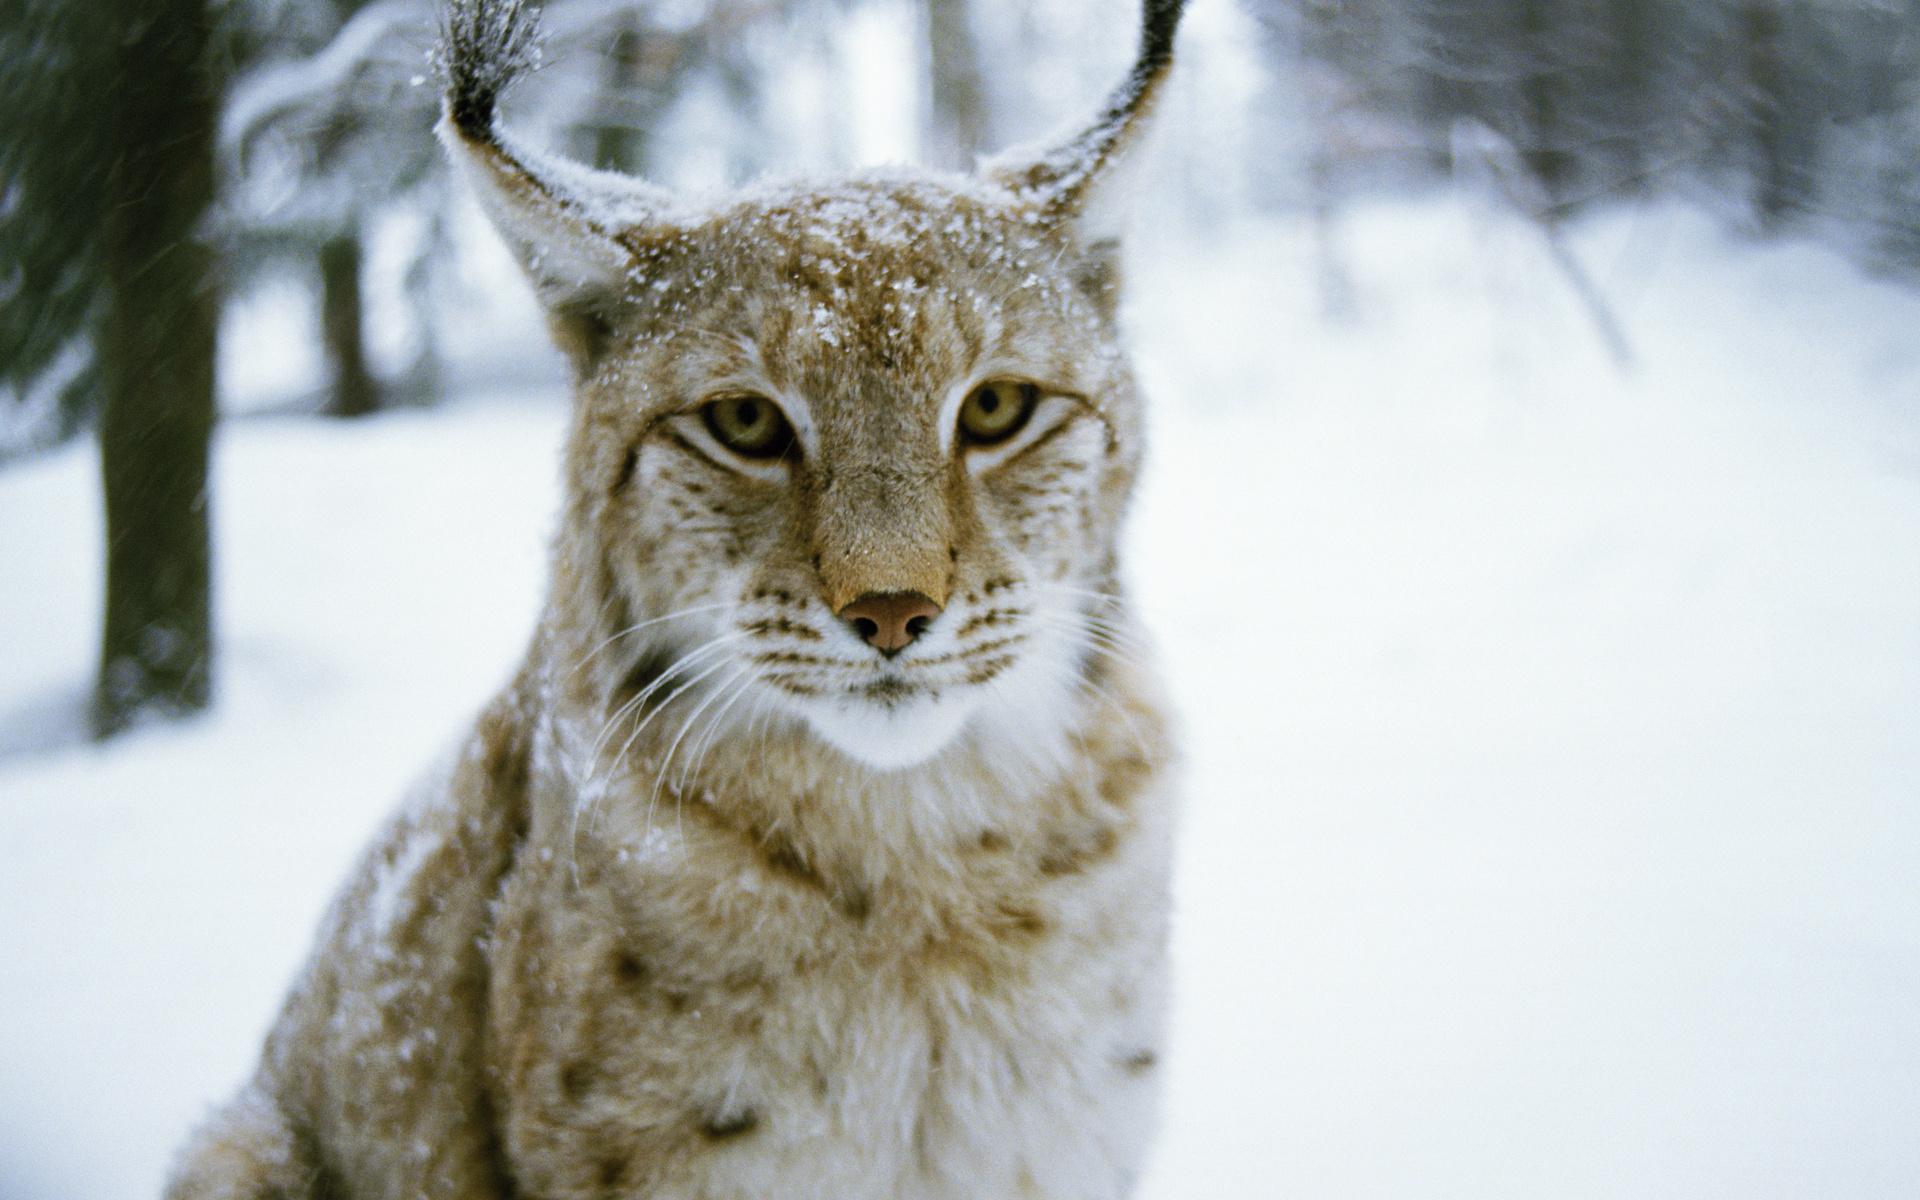 хищник, зима, wood, Рысь, lynx, кошка, winter, cat, predator, лес